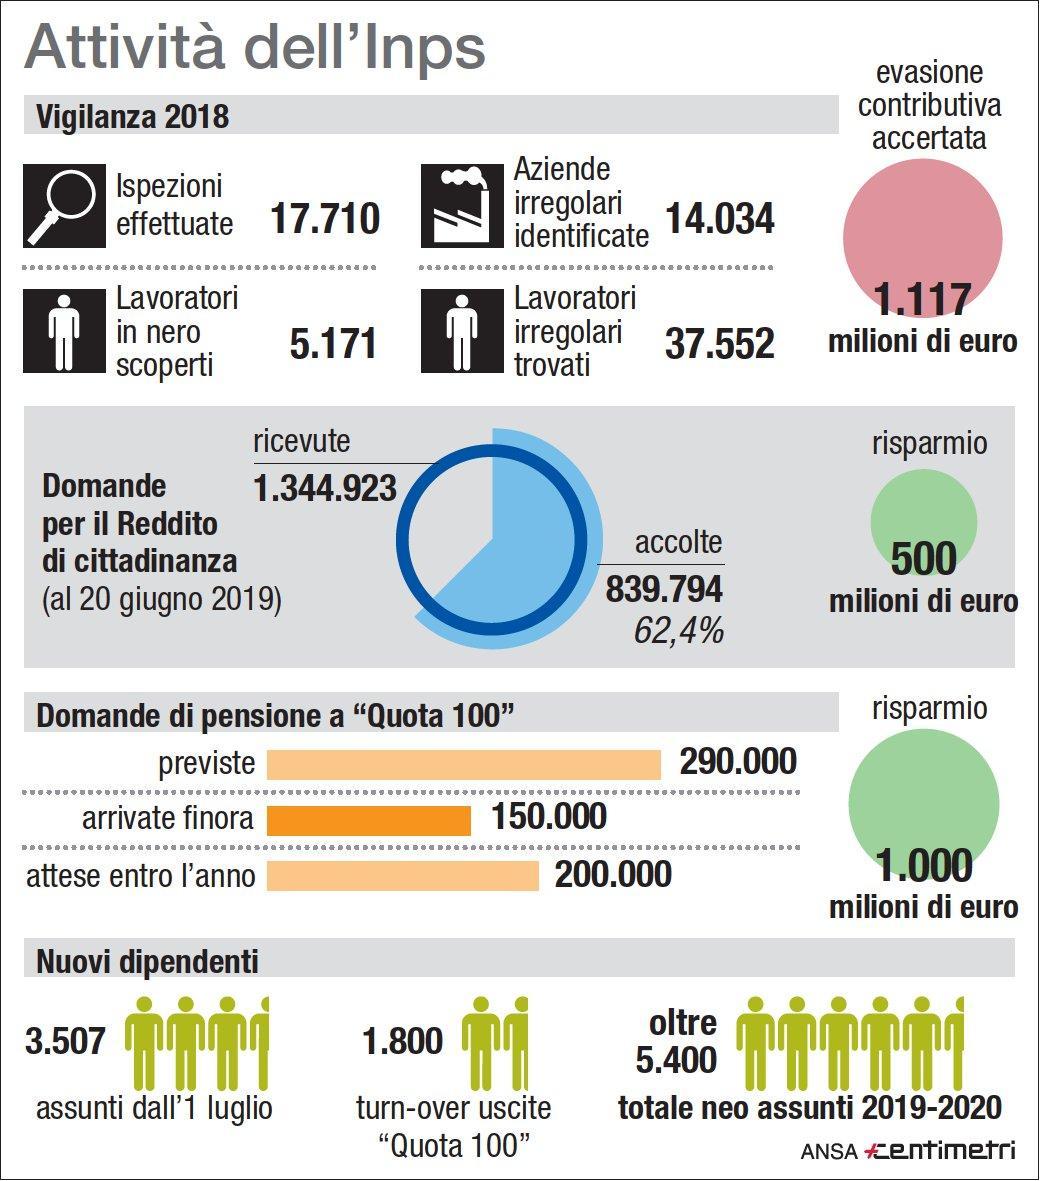 Inps, Di Maio annuncia 5 mila assunzioni per l'istituto